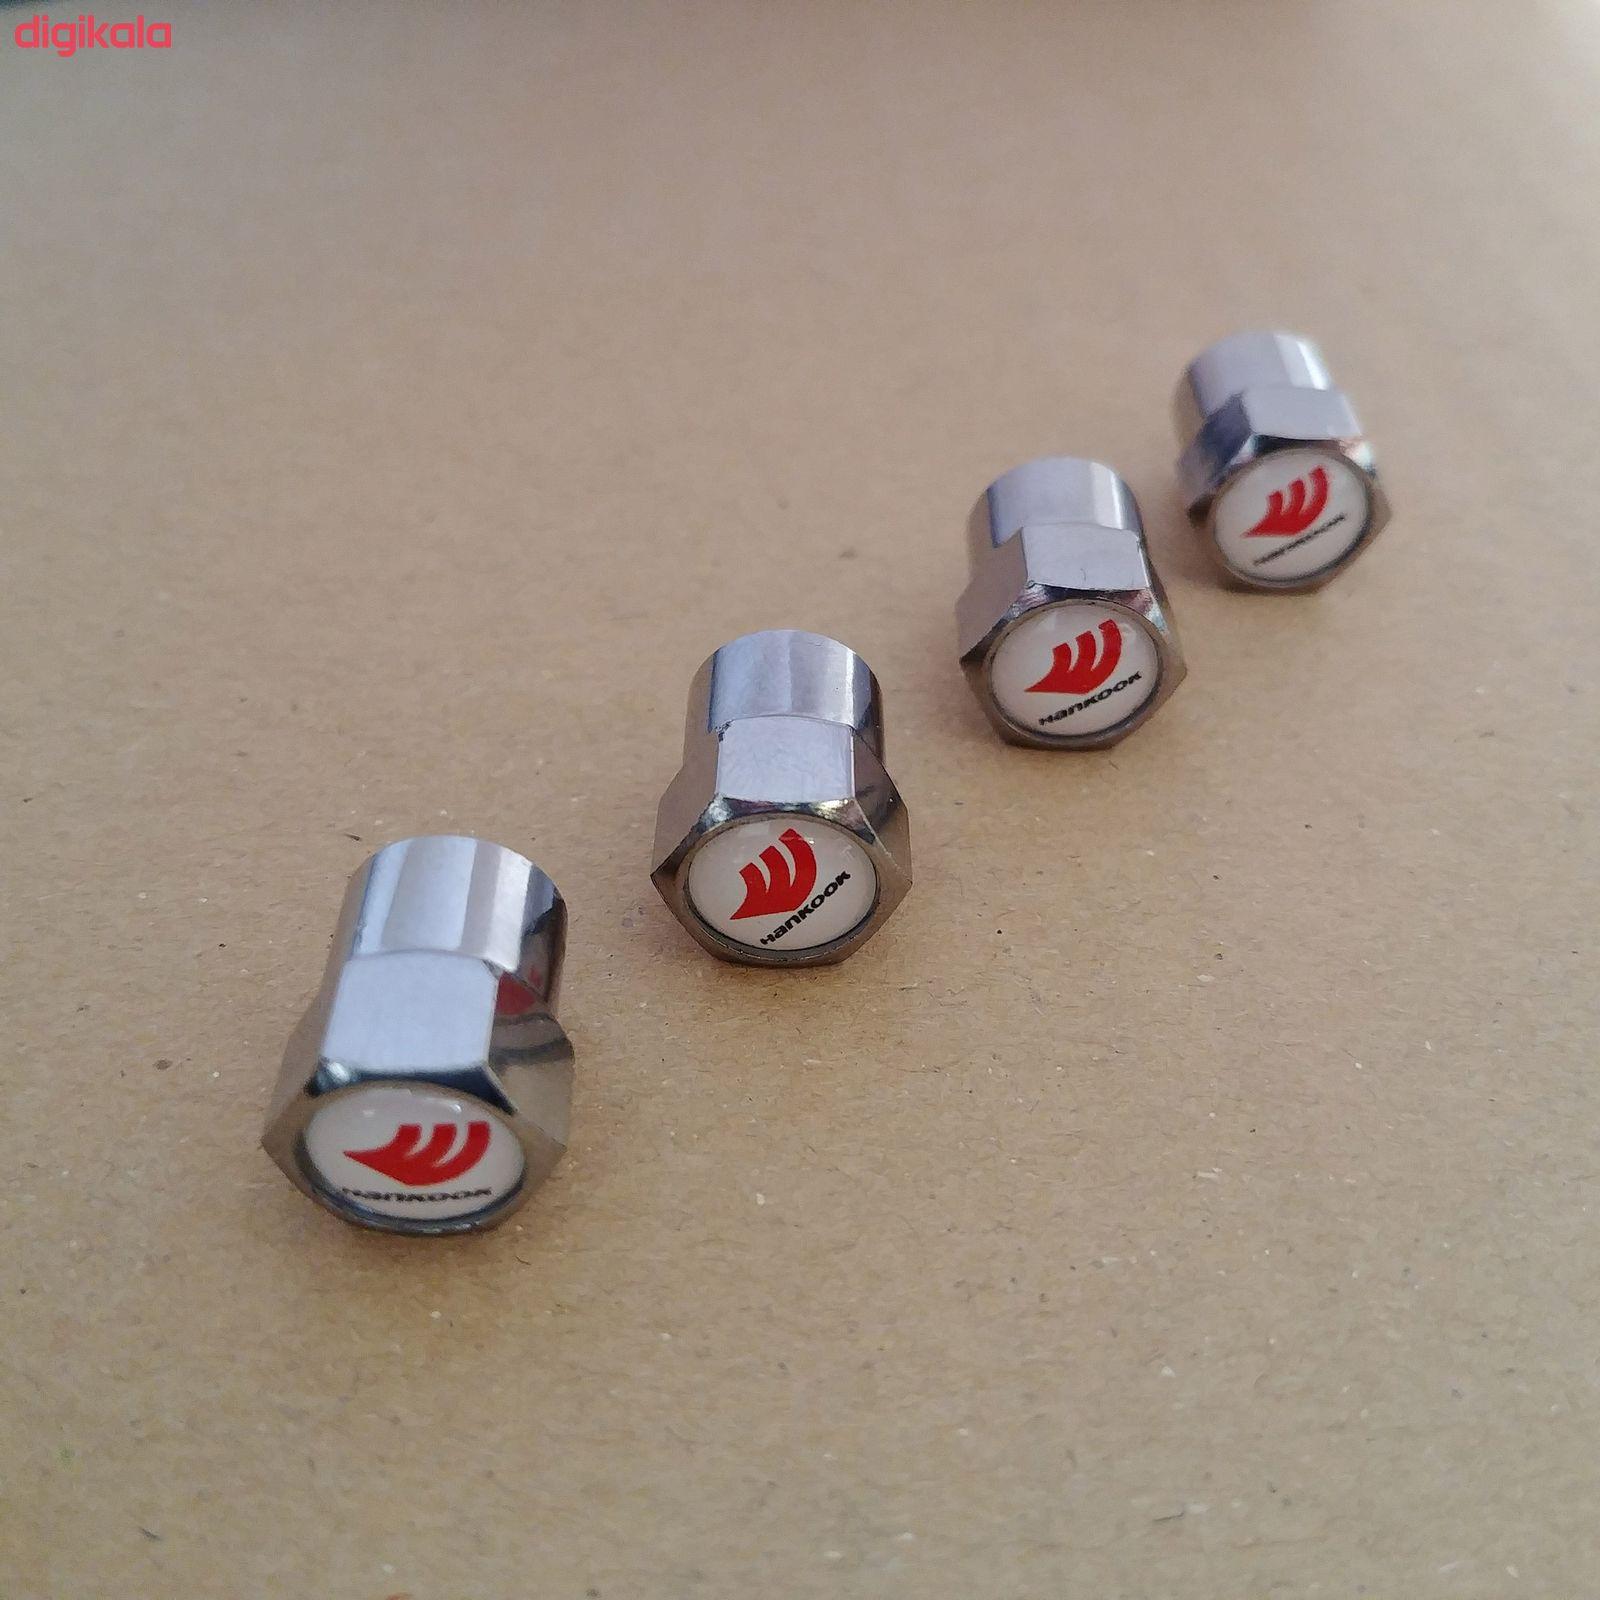 سر والف لاستیک خودرو مدل SH1 بسته 4 عددی main 1 1